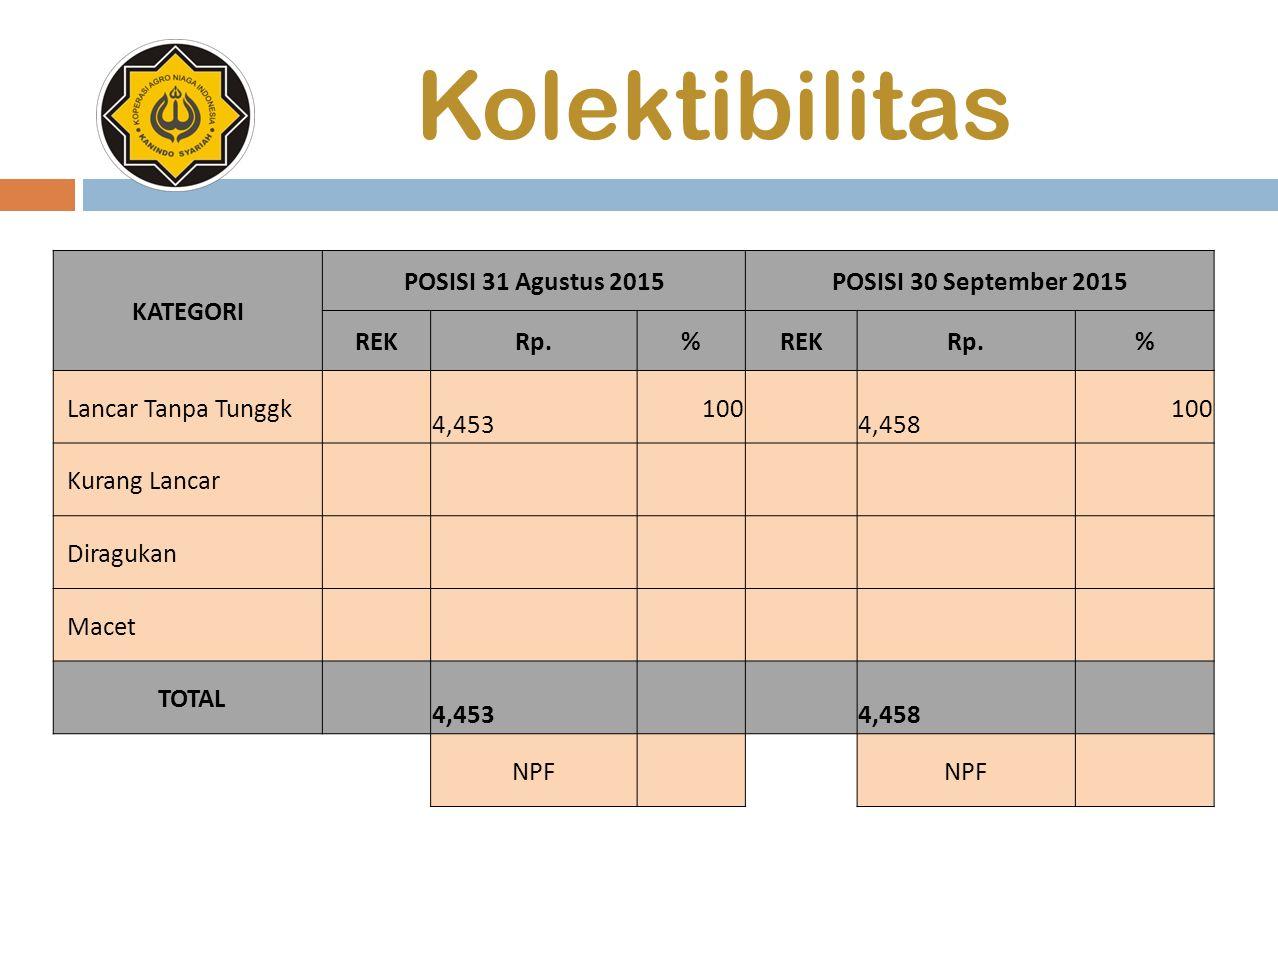 Kolektibilitas KATEGORI POSISI 31 Agustus 2015POSISI 30 September 2015 REKRp.%REKRp.% Lancar Tanpa Tunggk 4,453 100 4,458 100 Kurang Lancar Diragukan